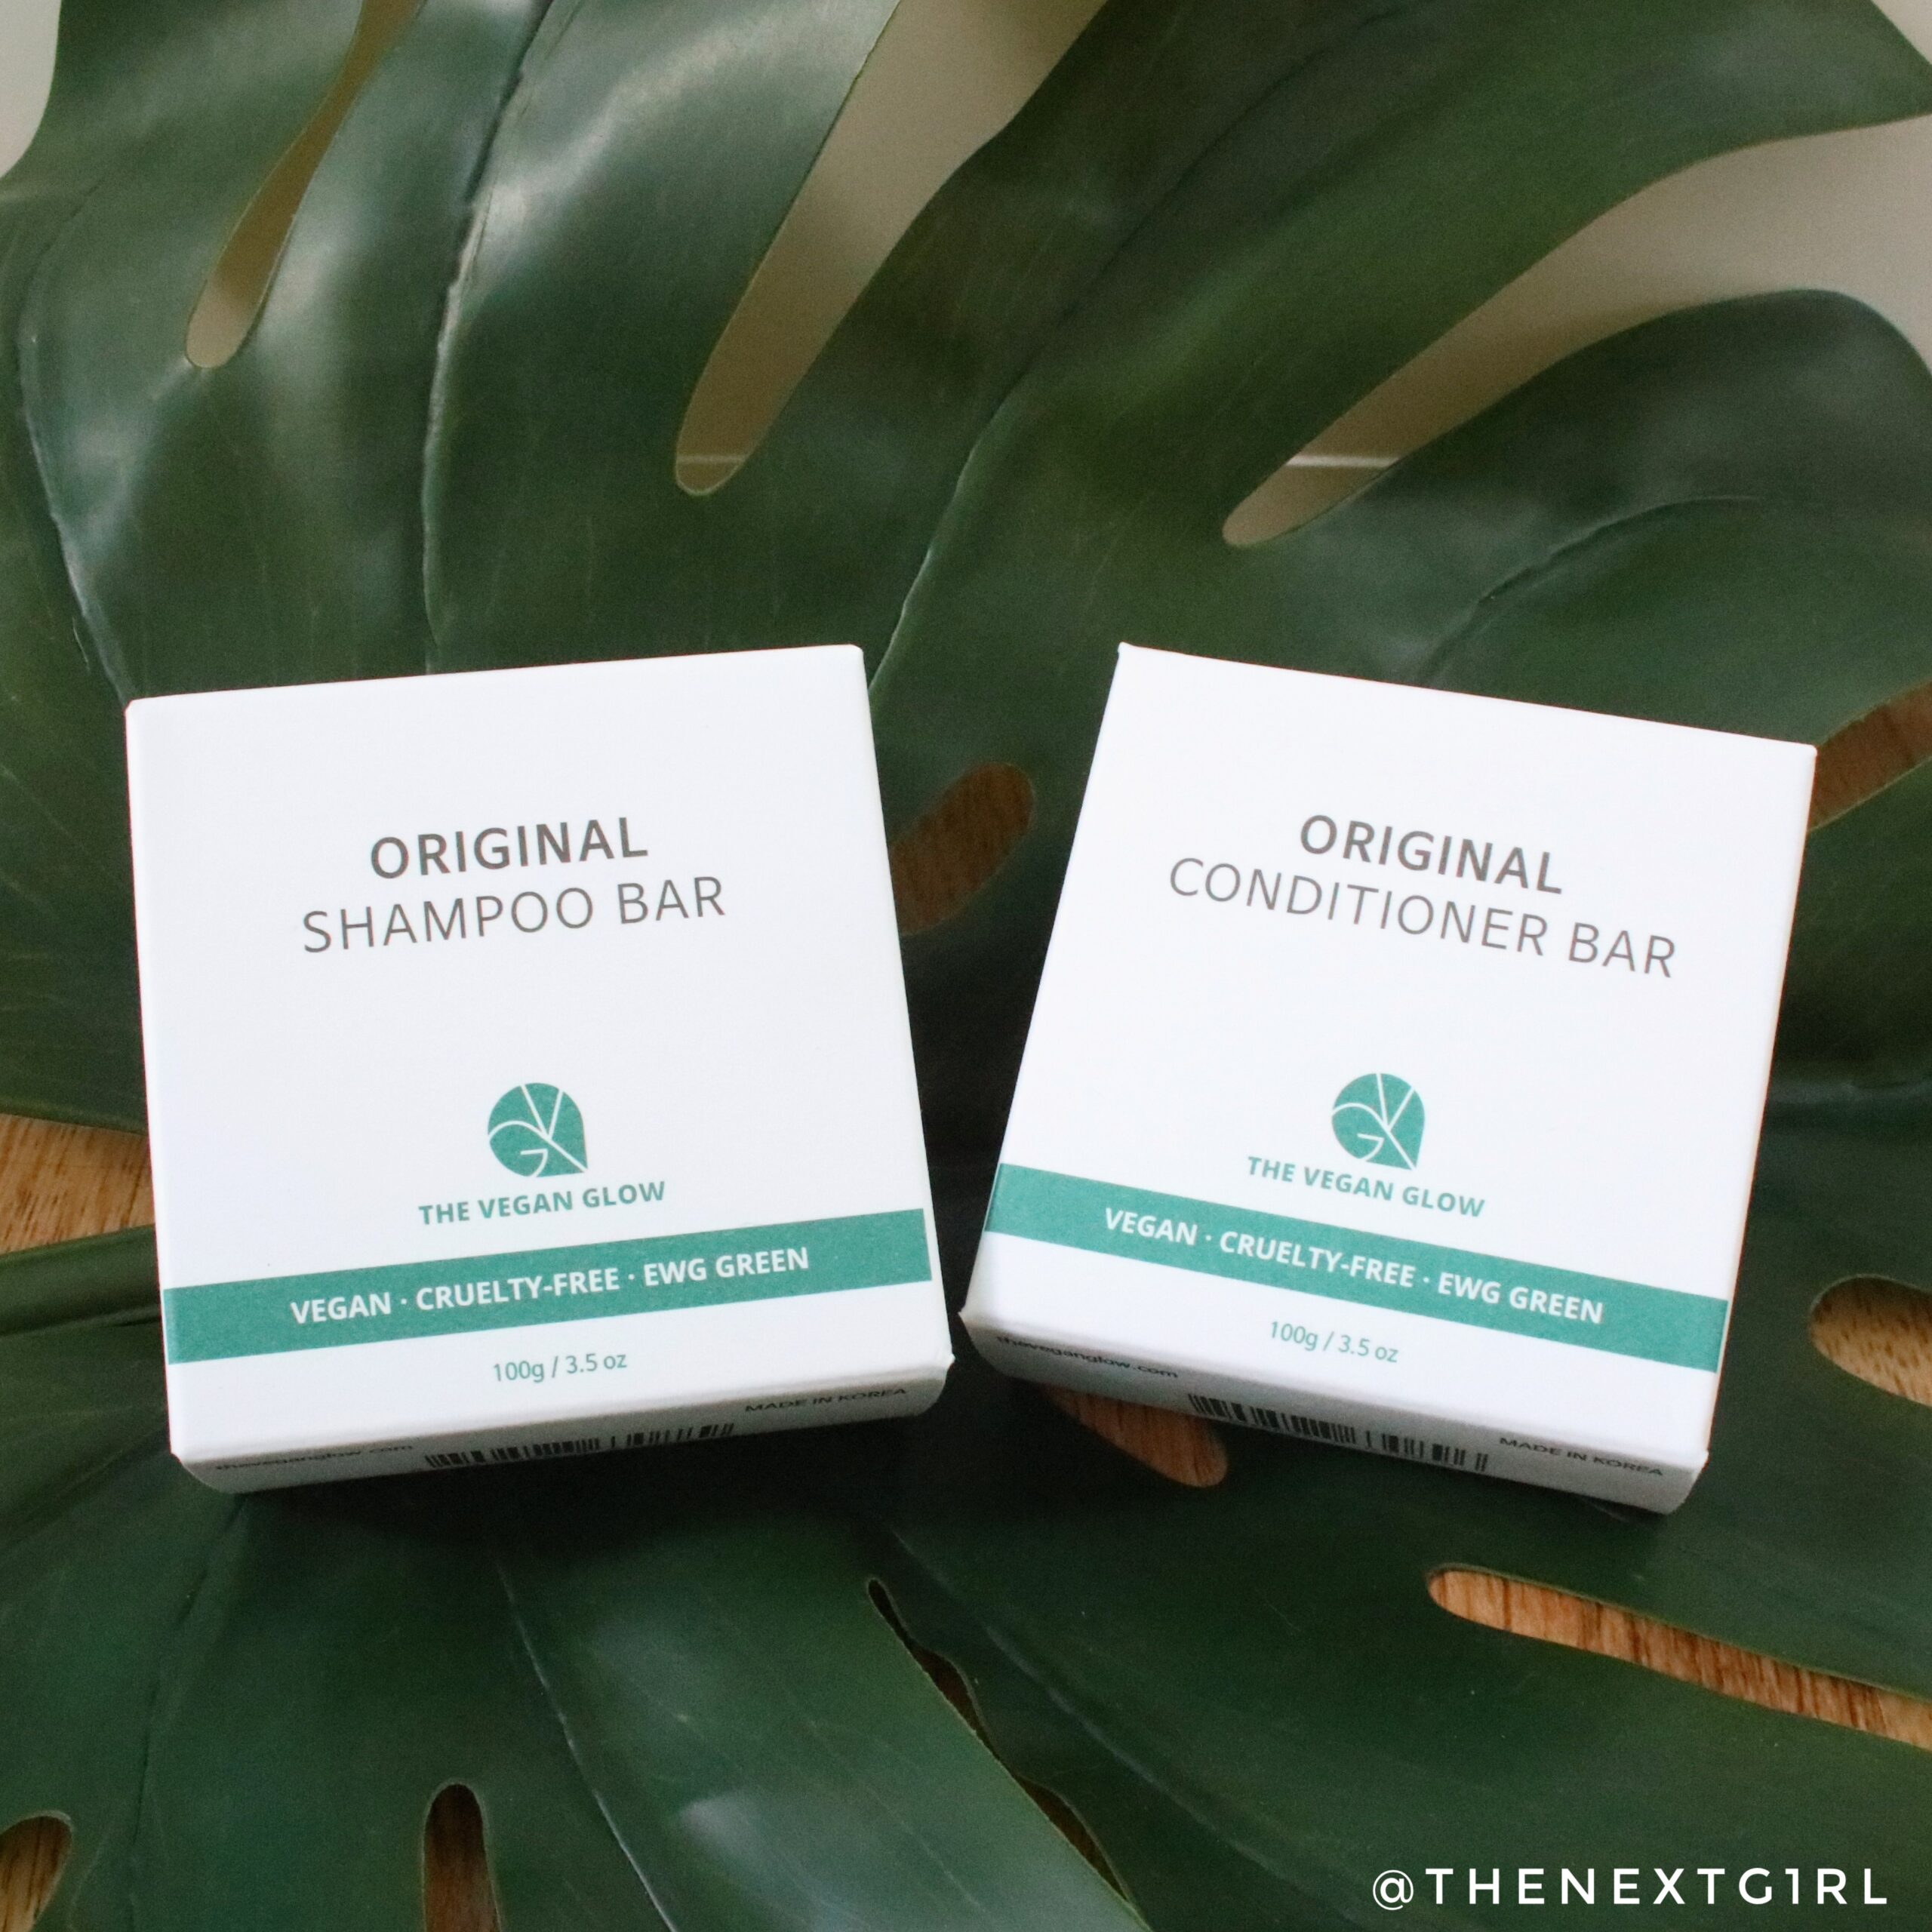 The Vegan Glow shampoo conditioner bar verpakking